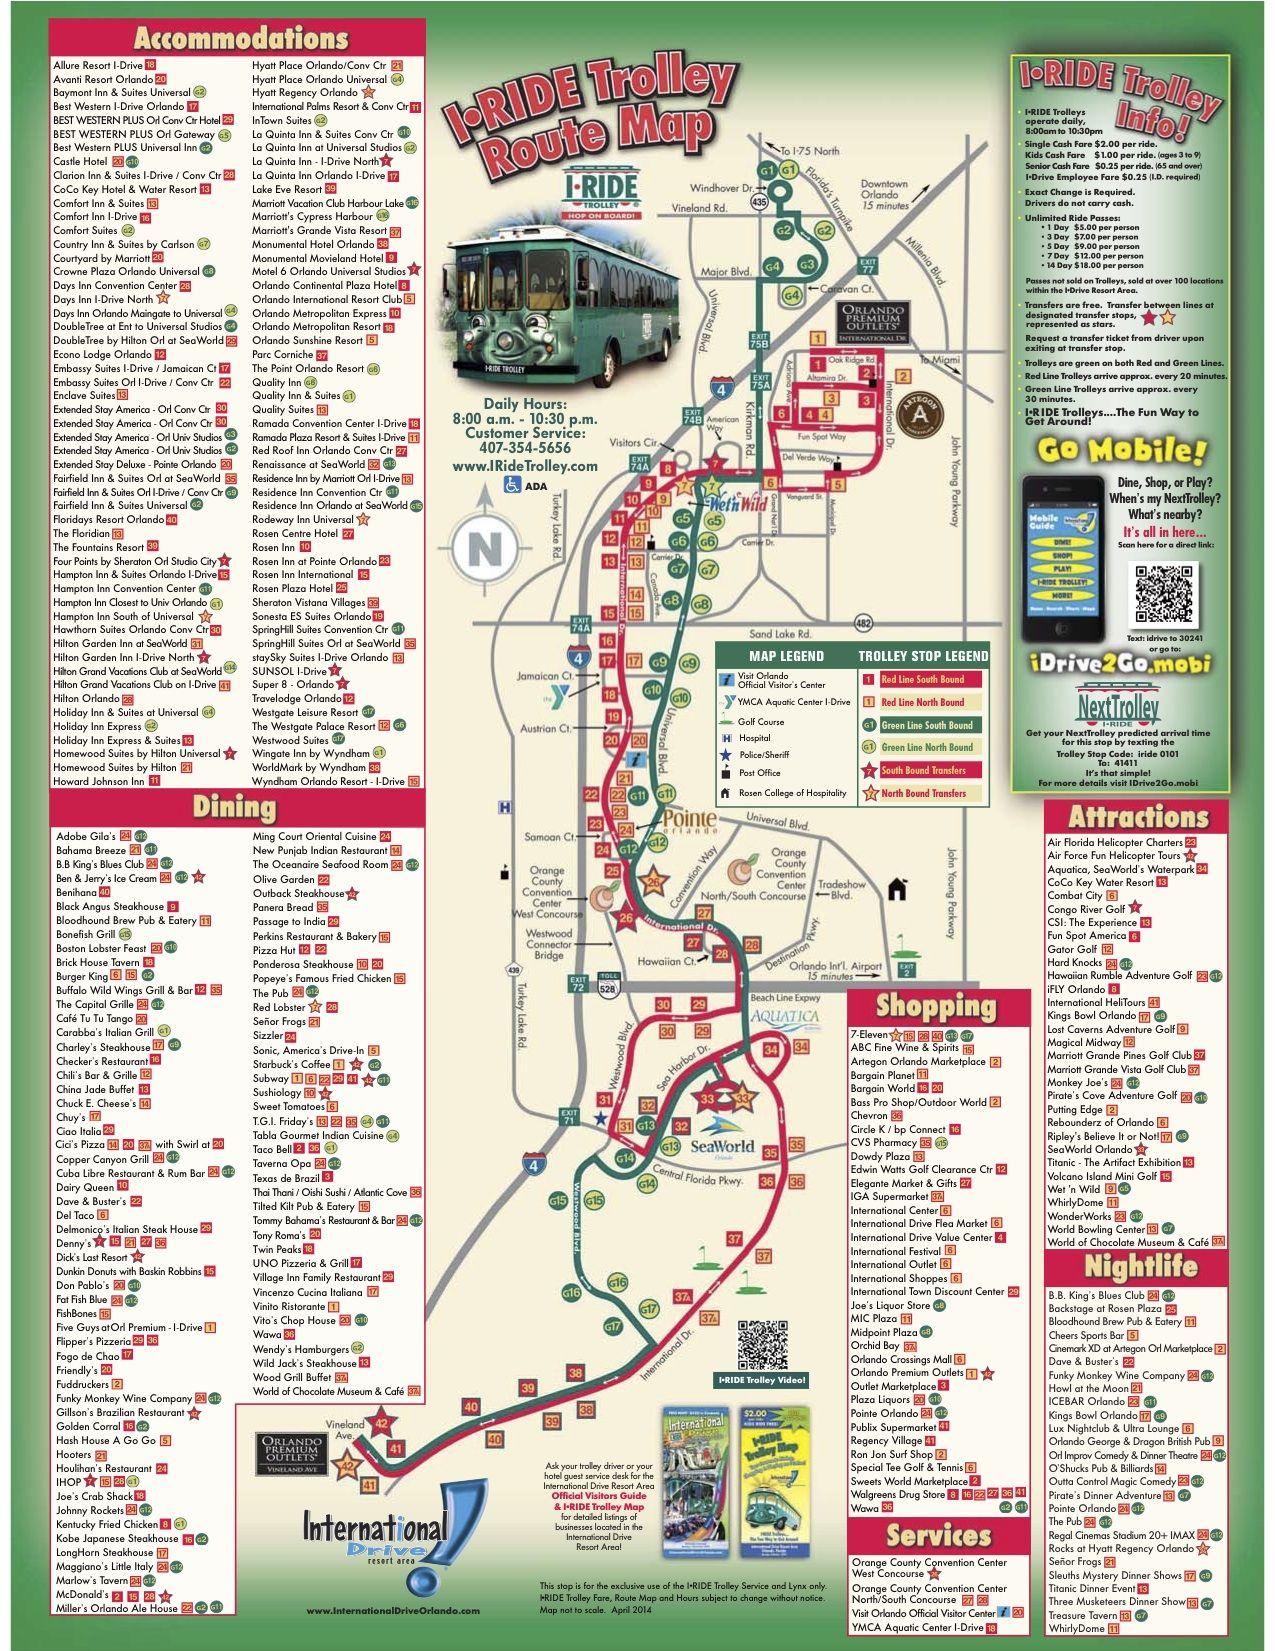 i ride orlando map I Ride Trolley Route Map New Orleans Travel Guide Orlando Travel Florida Travel i ride orlando map